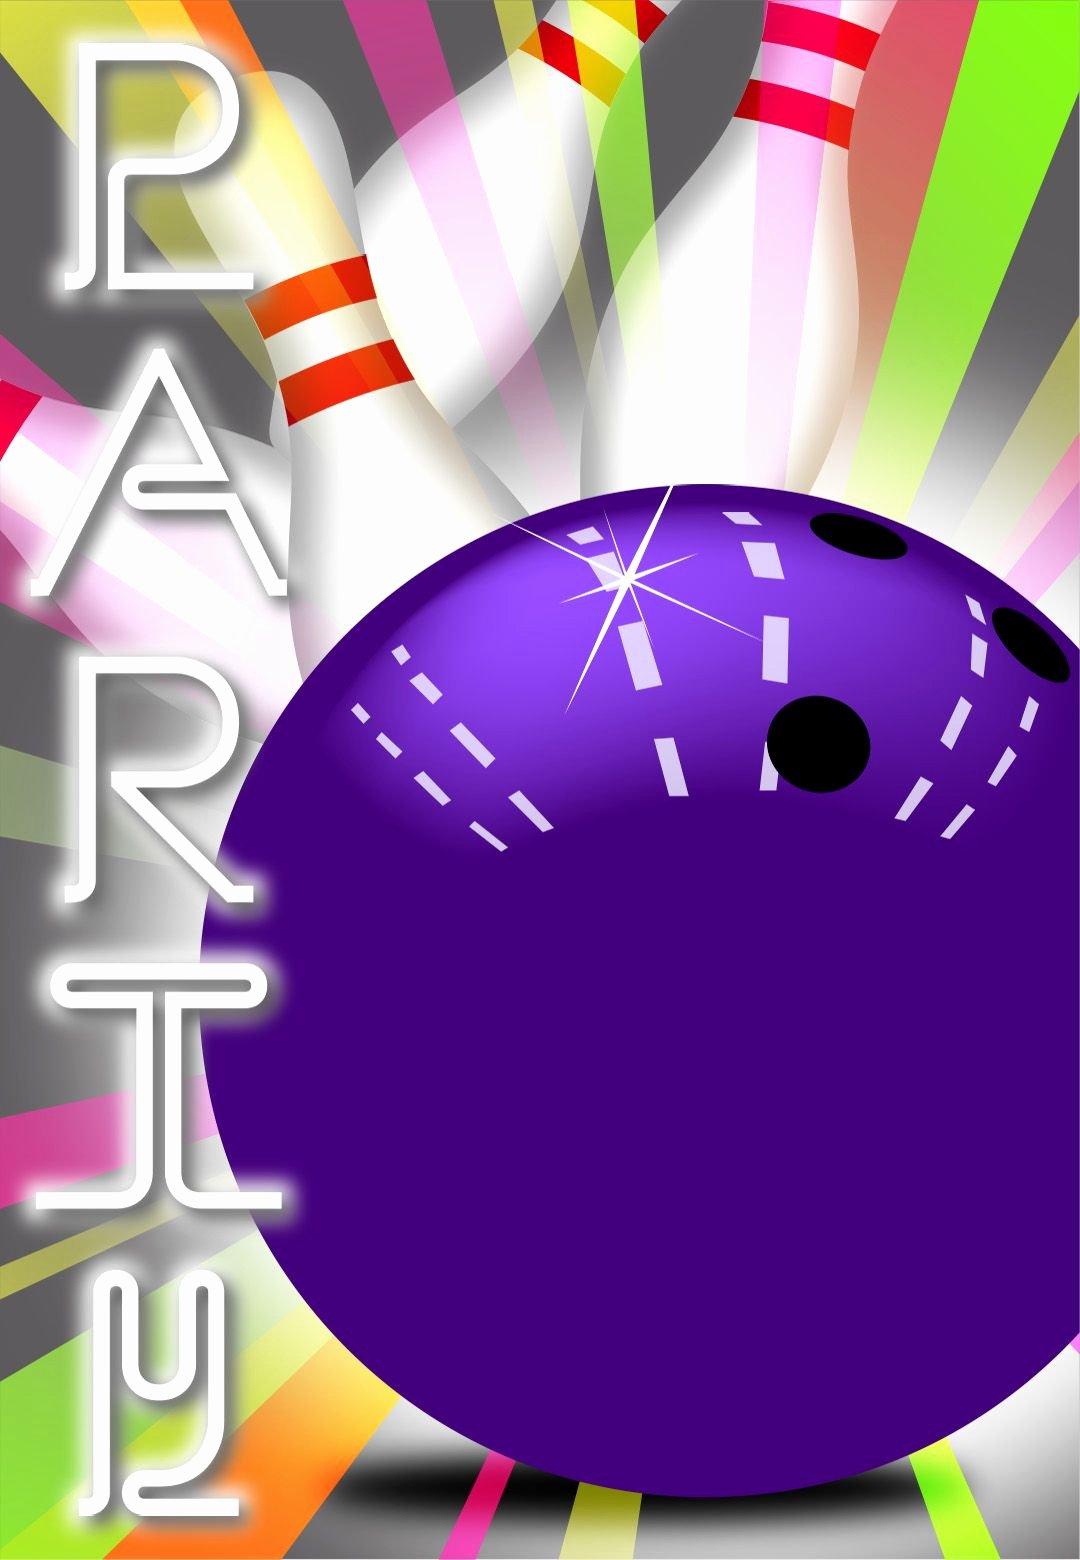 Free Bowling Invitations Template Awesome Strike Bowling Free Printable Birthday Invitation